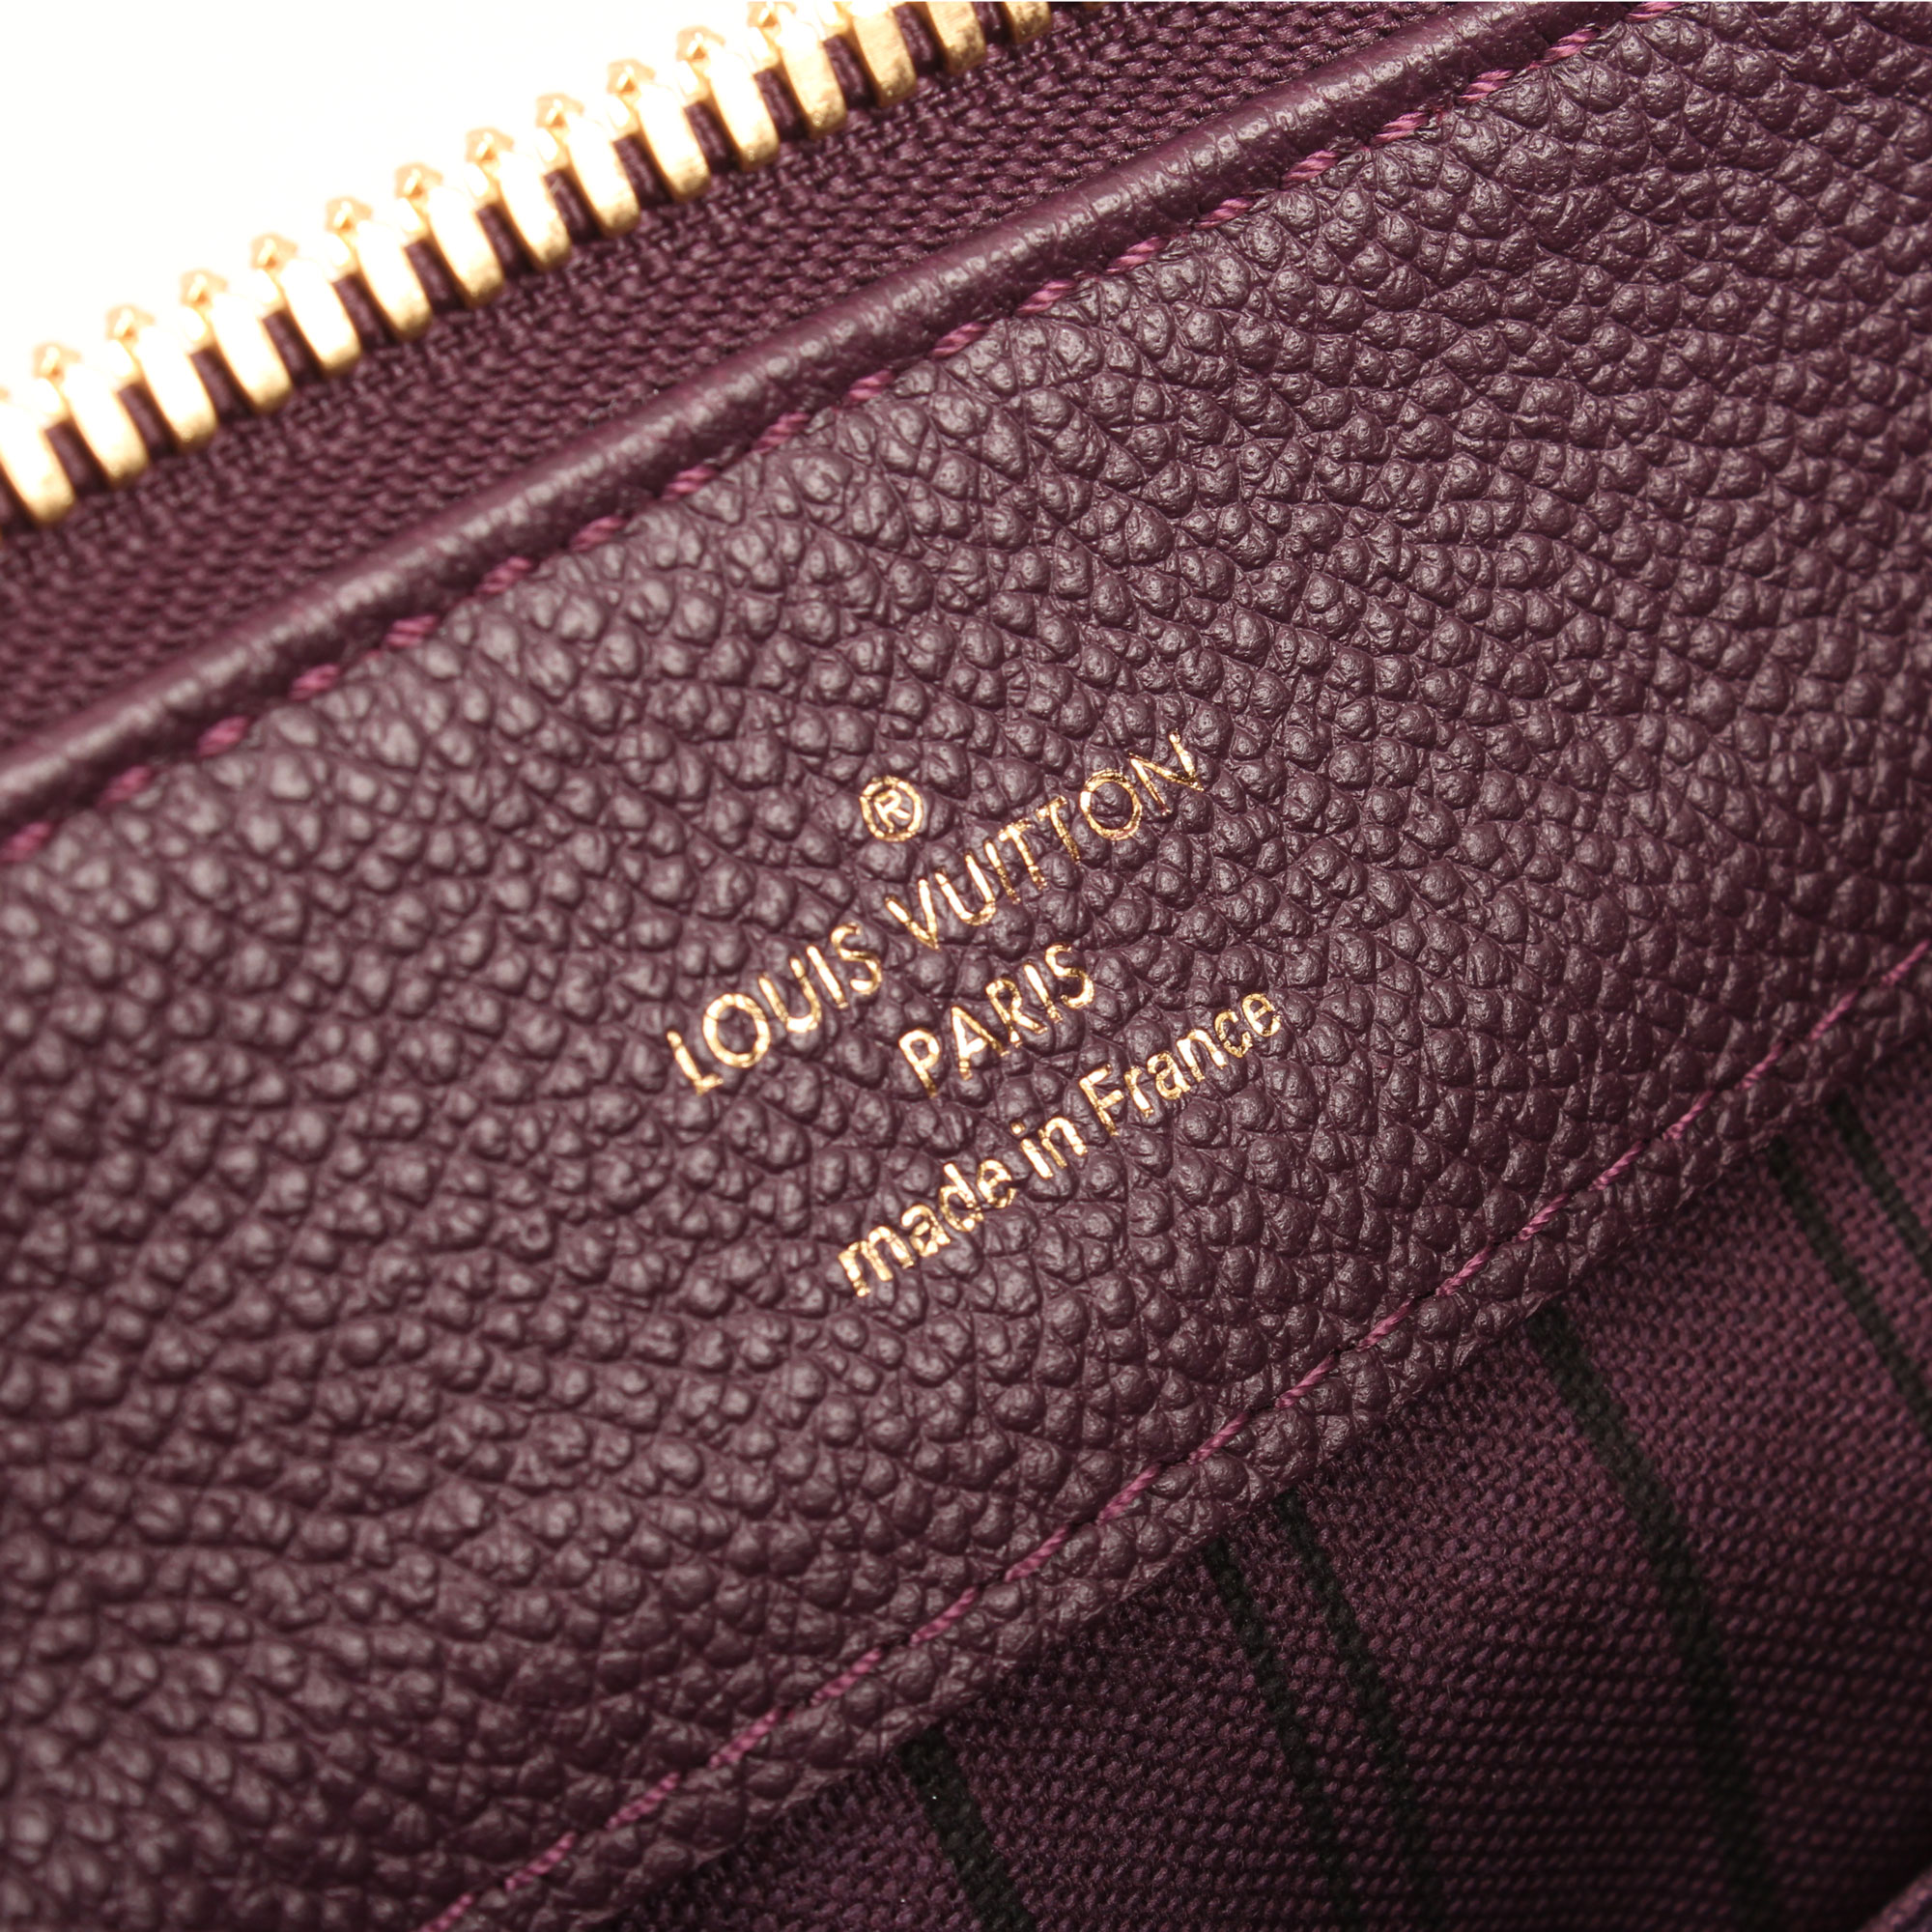 Brand image of louis vuitton audacieuse embossed monogram bag suede plum